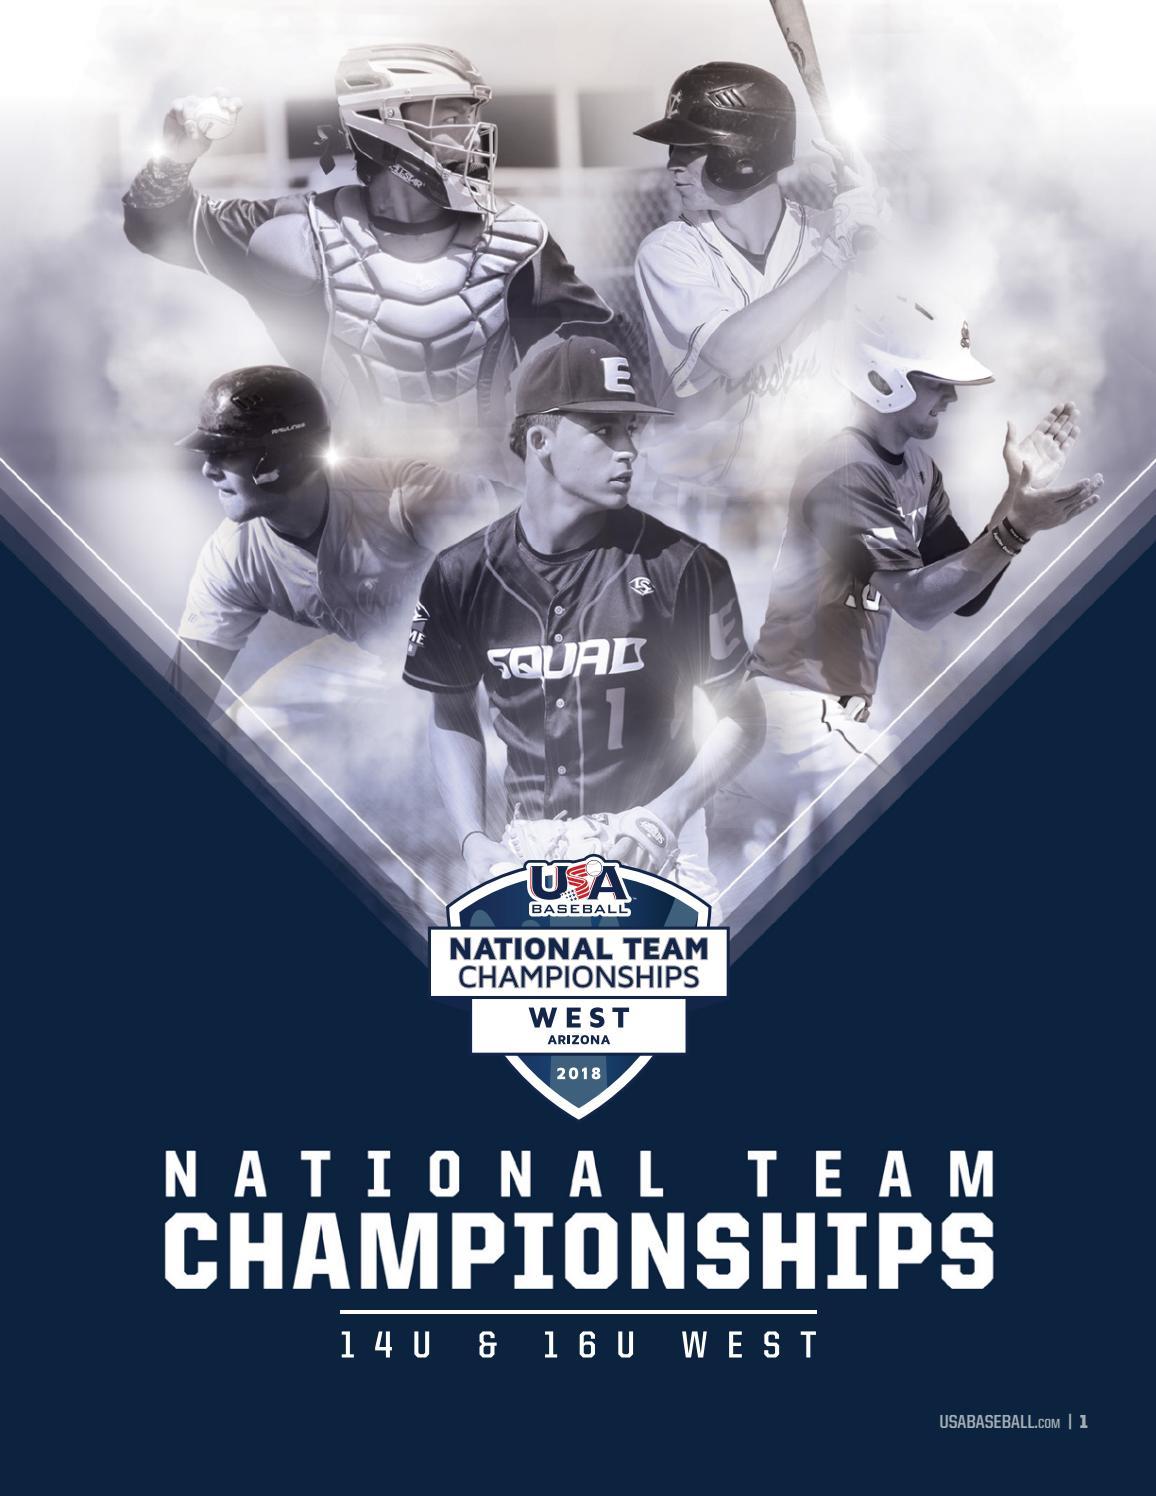 2018 National Team Championships Program - 14U & 16U West by USA